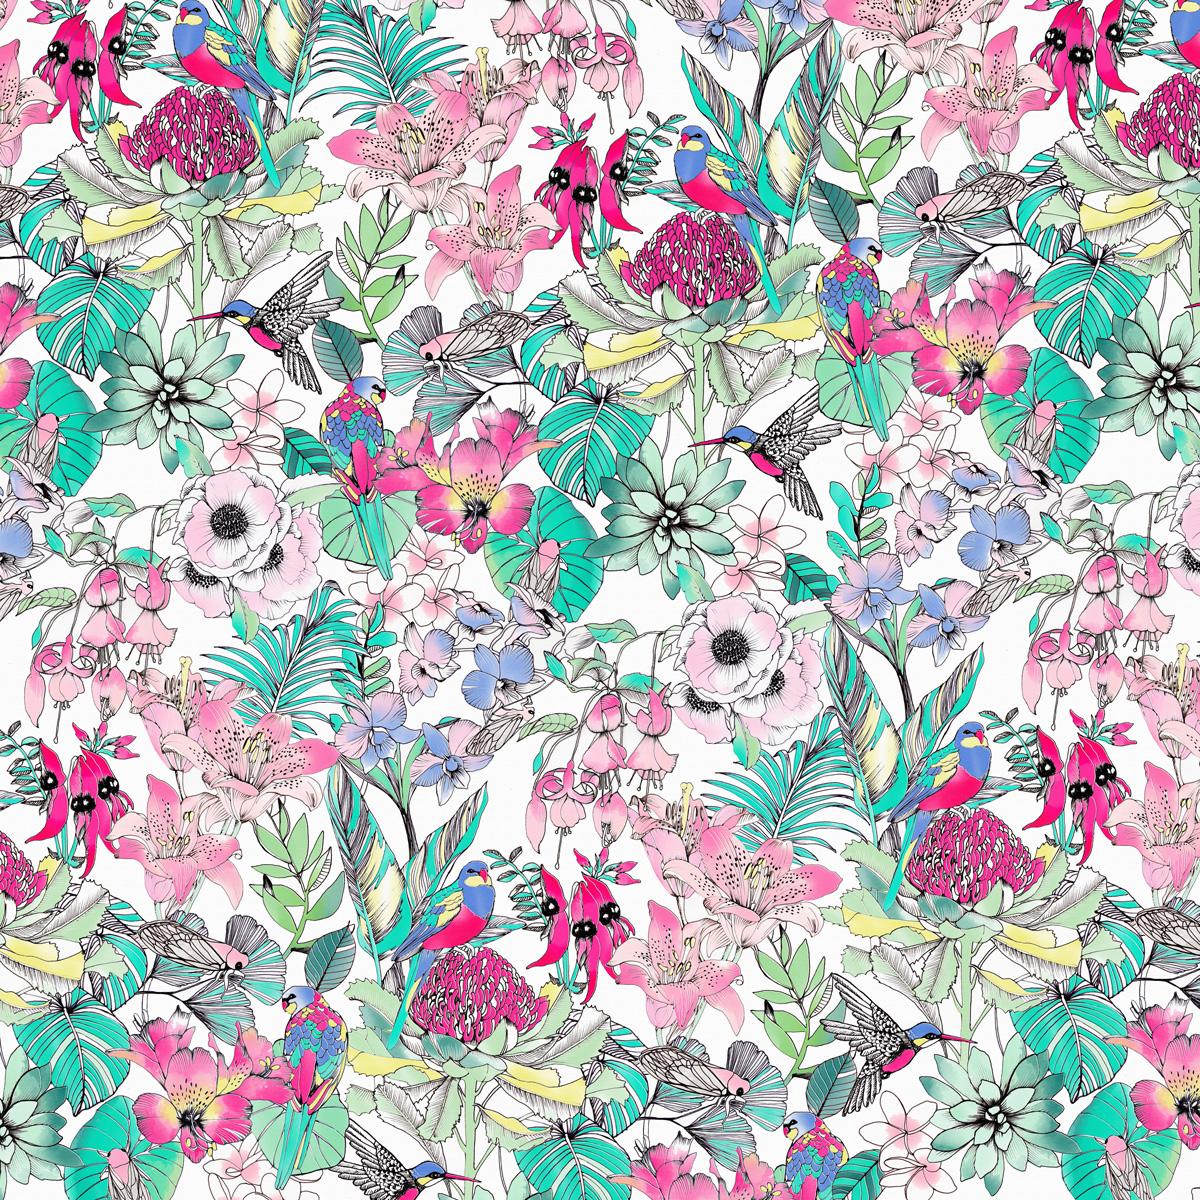 australian-flora-fauna-print-pattern.jpg